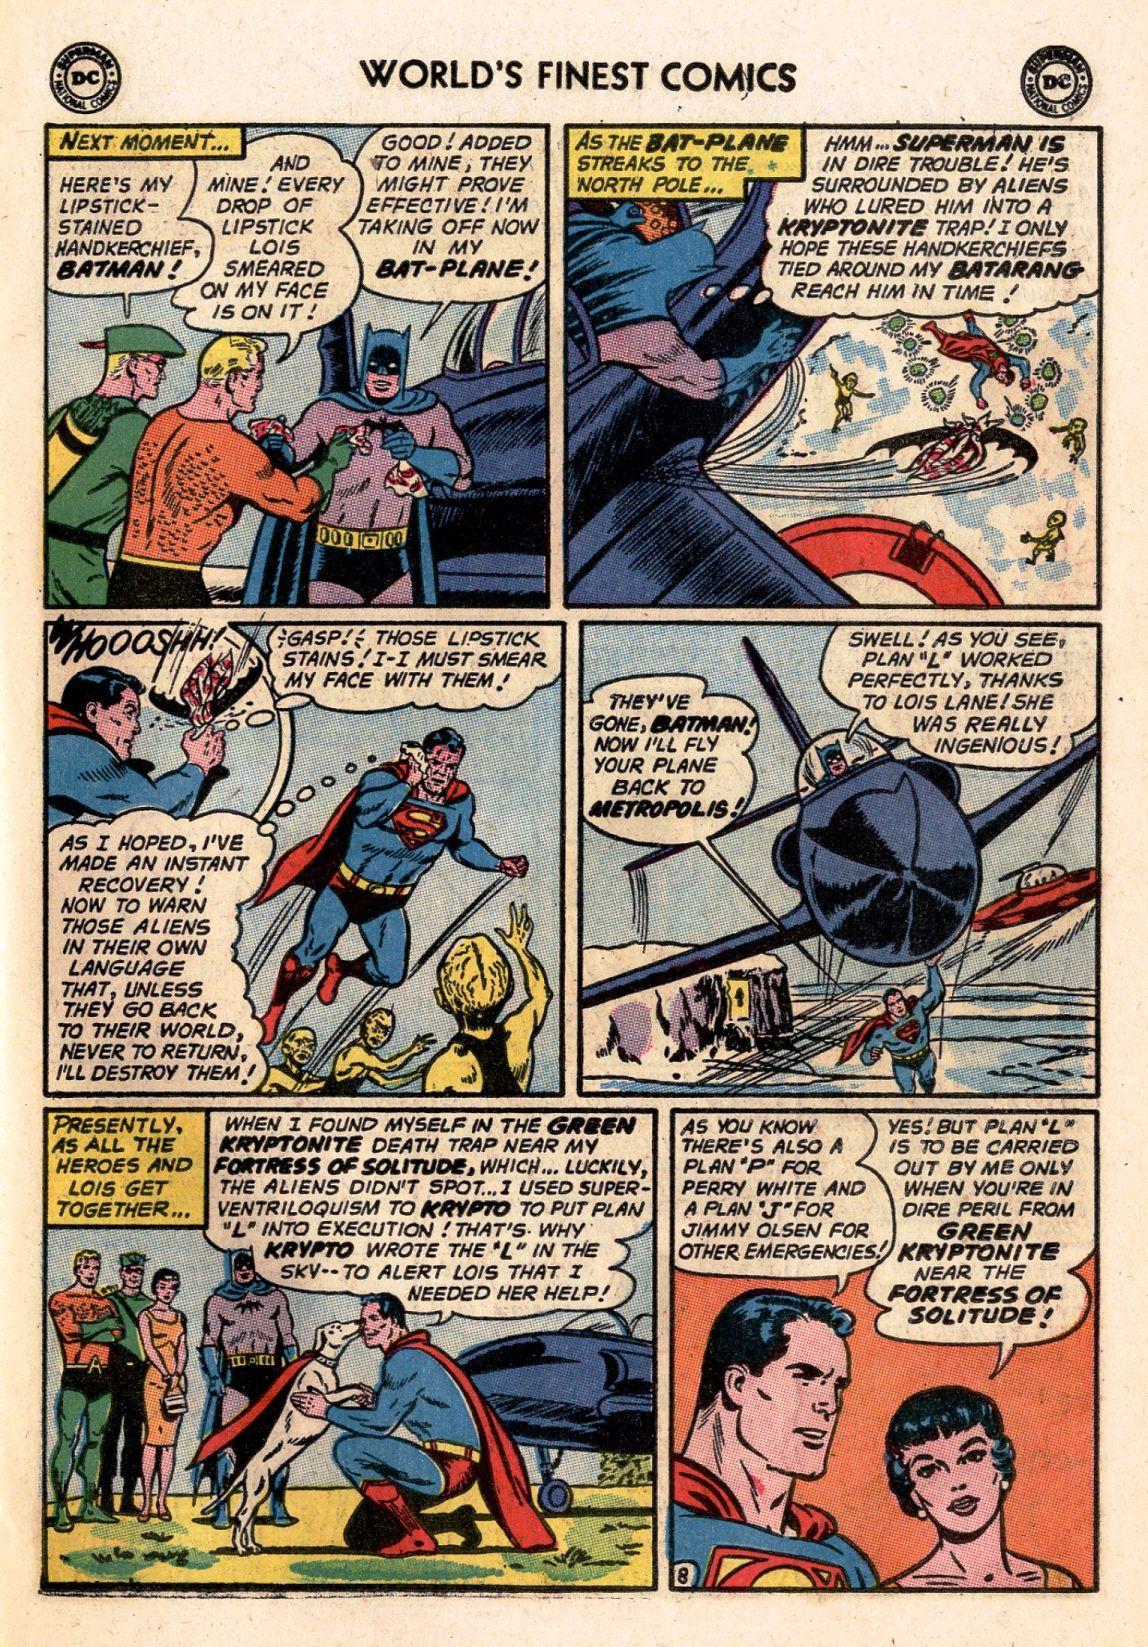 Read online World's Finest Comics comic -  Issue #141 - 31